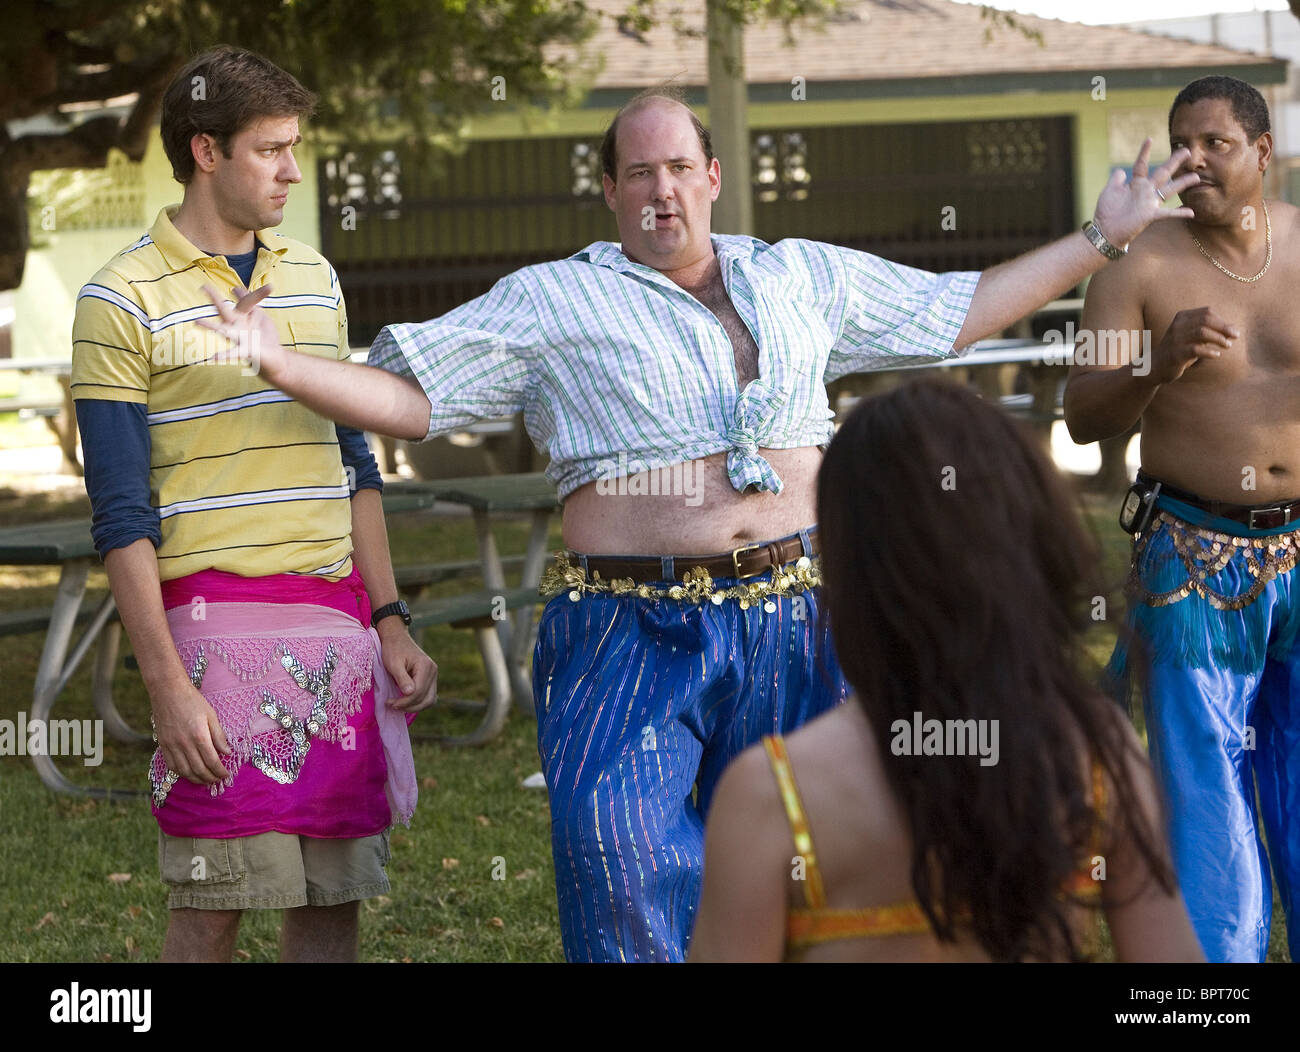 John Krasinski Brian Baumgartner License To Wed 2007 Stock Photo Alamy